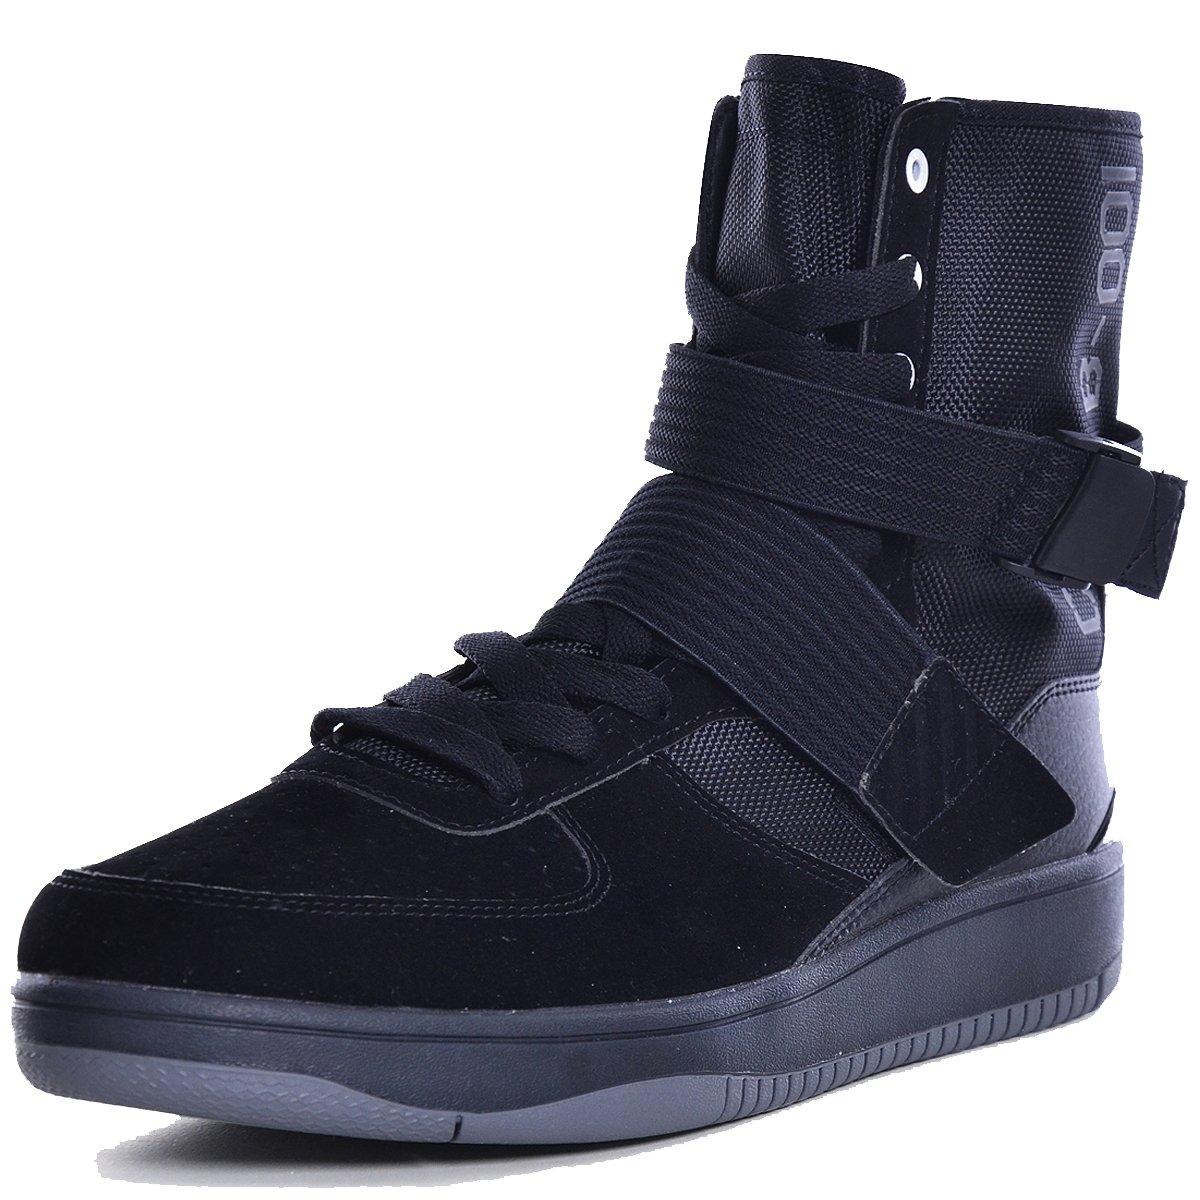 LI-NING Men Sport Walking Shoes Fitness Support Sneakers Sock-Like Fashion Lining Sneakers Sports Shoes US SIZE 8.5 FEET LENGTH 260MM|2h Men